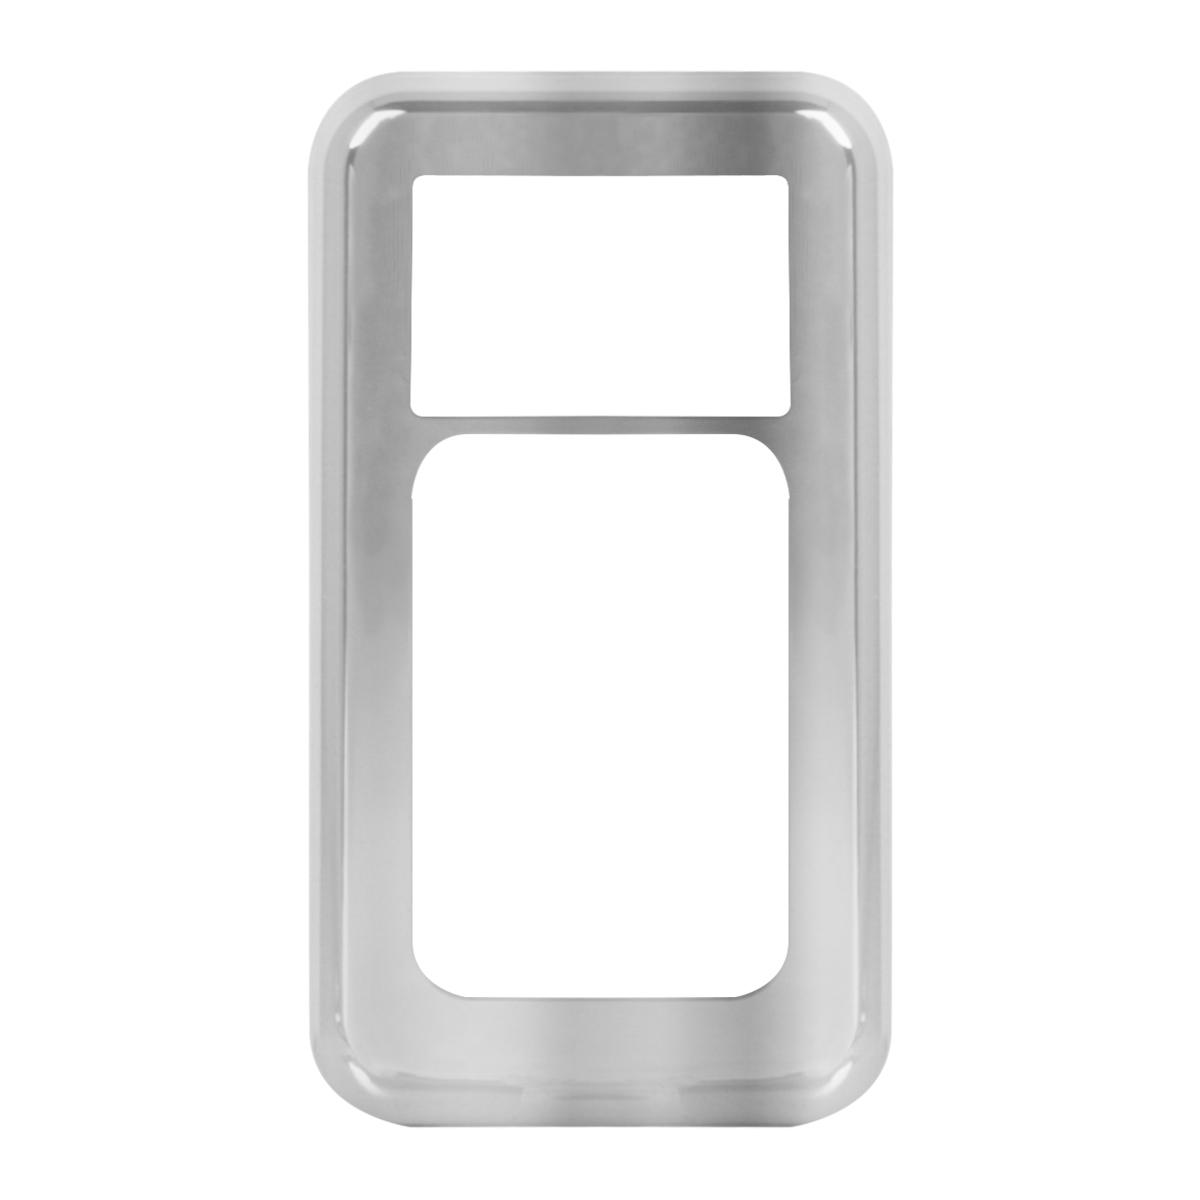 69005 Switch Plate Bezel for International I